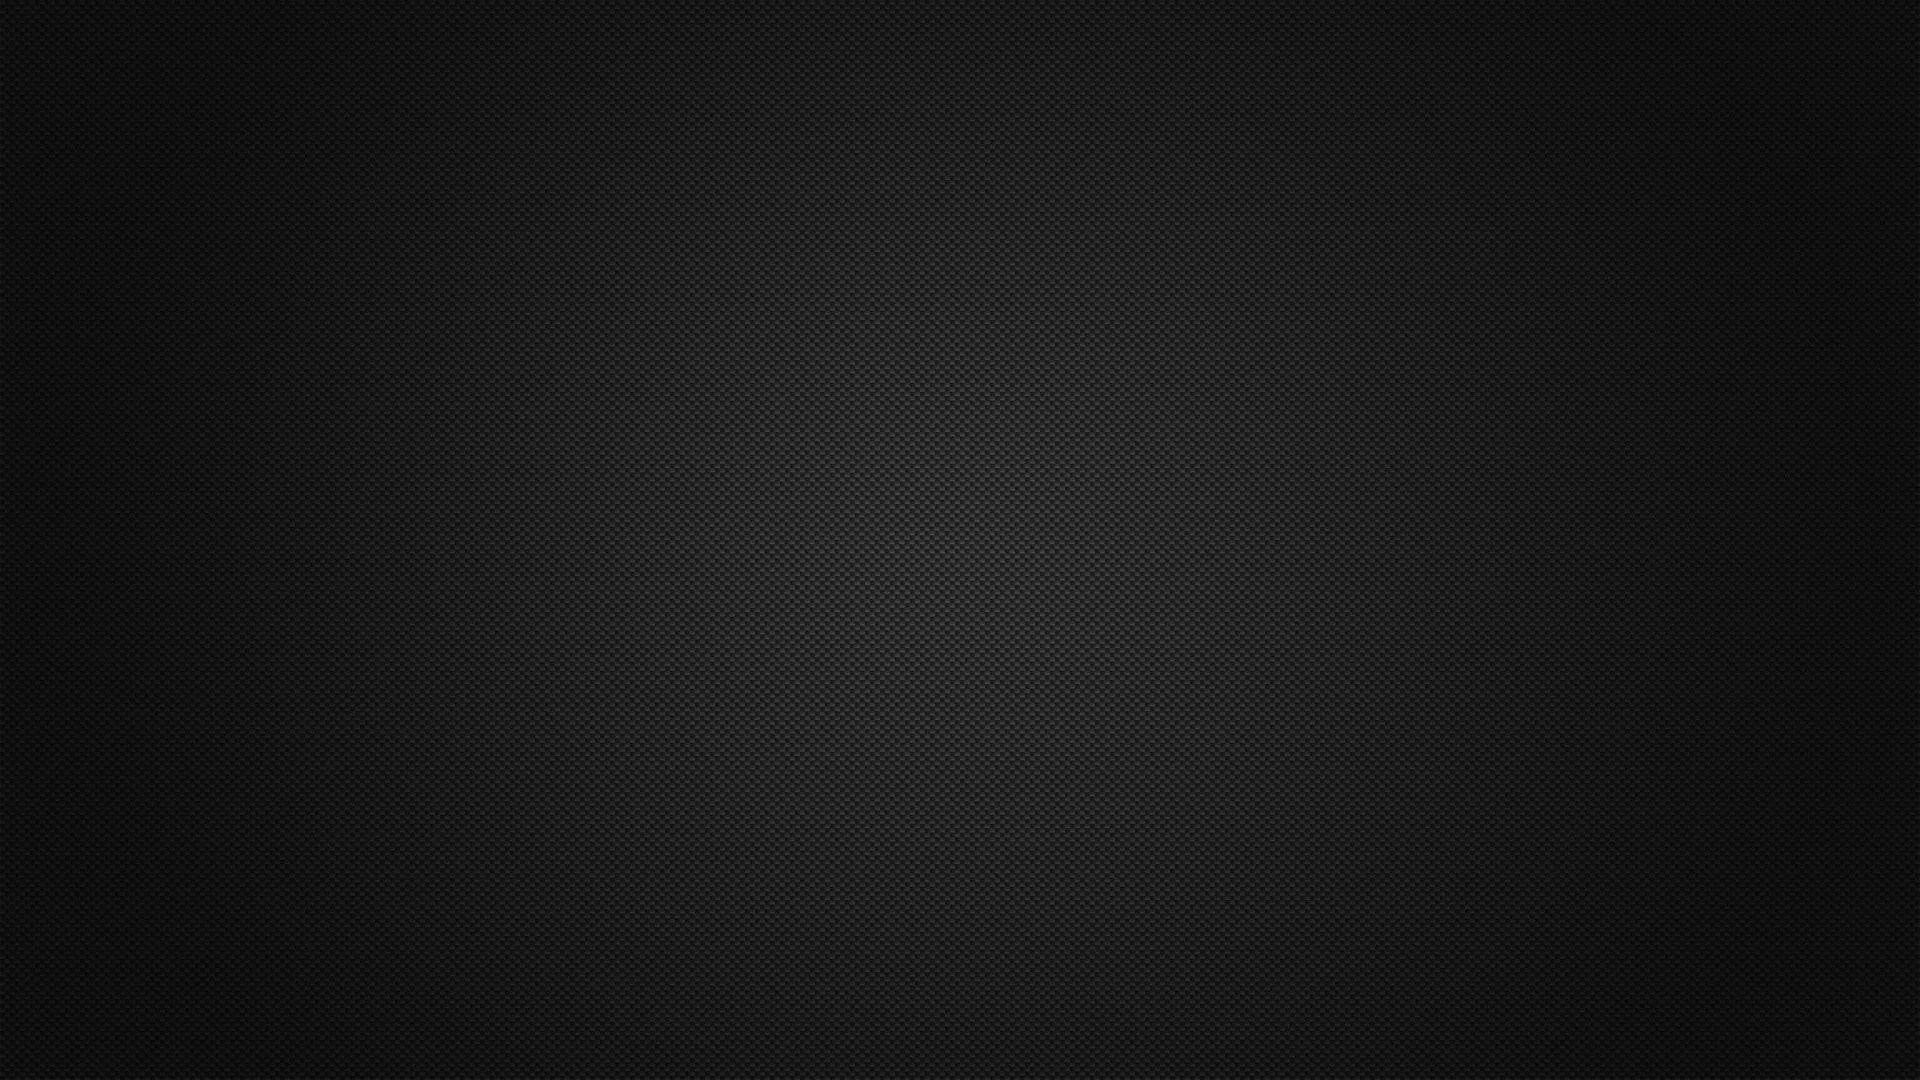 Black Screen wallpaper photo hd